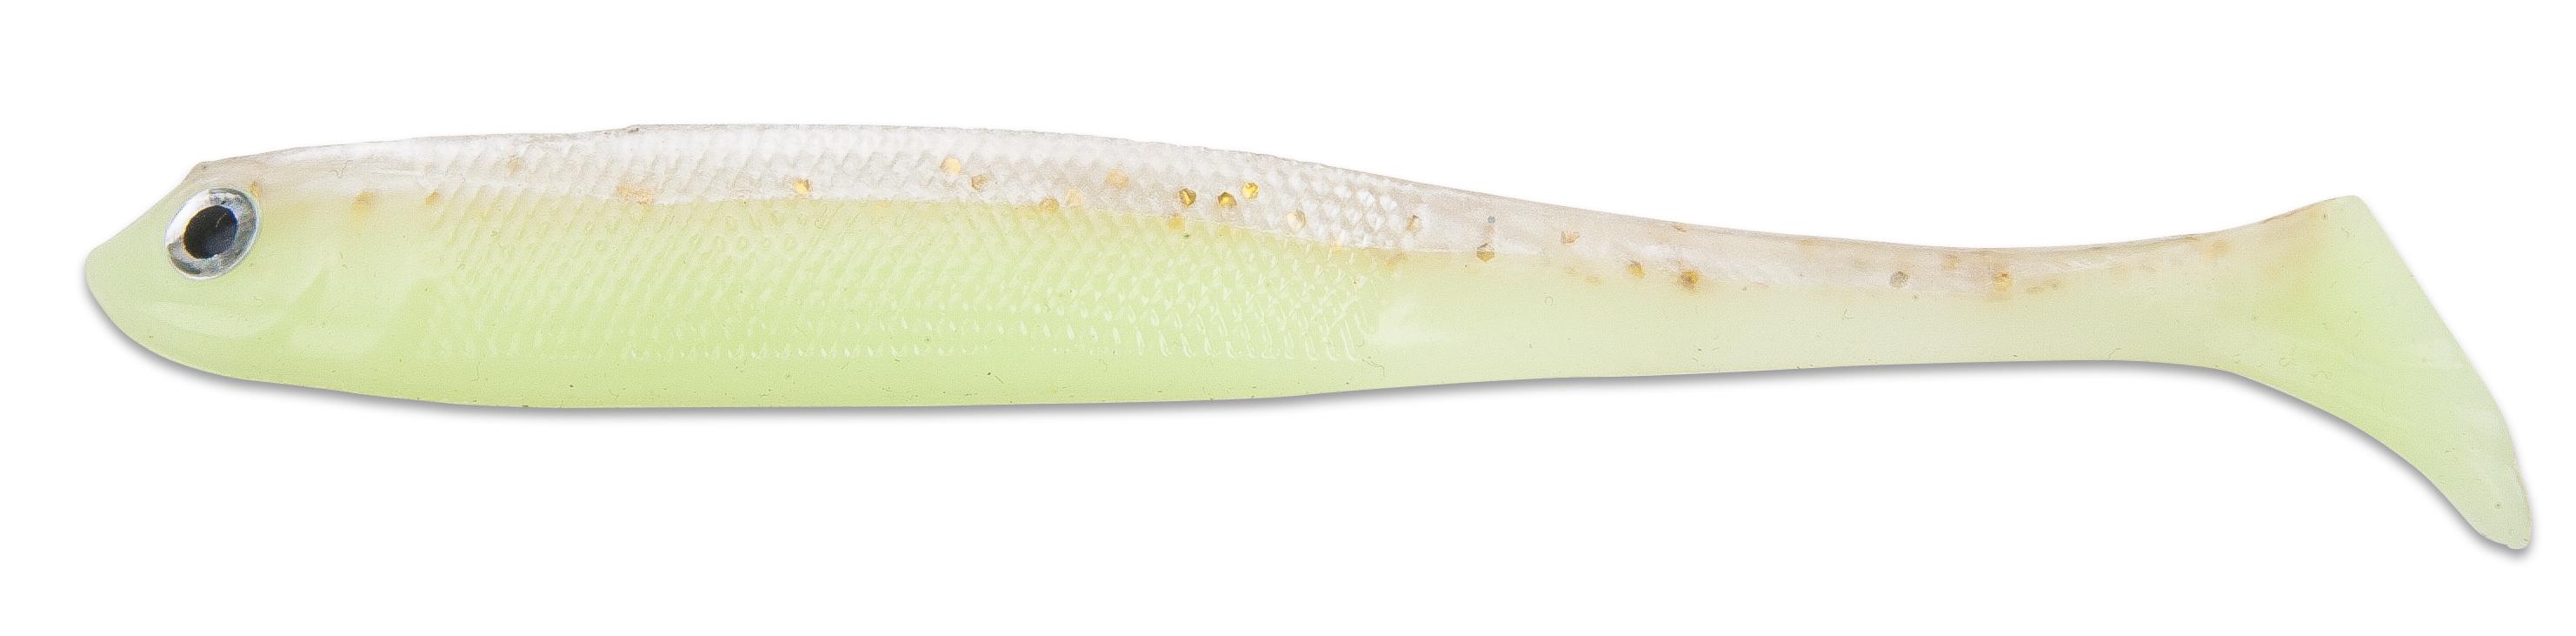 Iron Claw gumová nástraha Slim Jim 16 cm Vzor LU, 3 ks